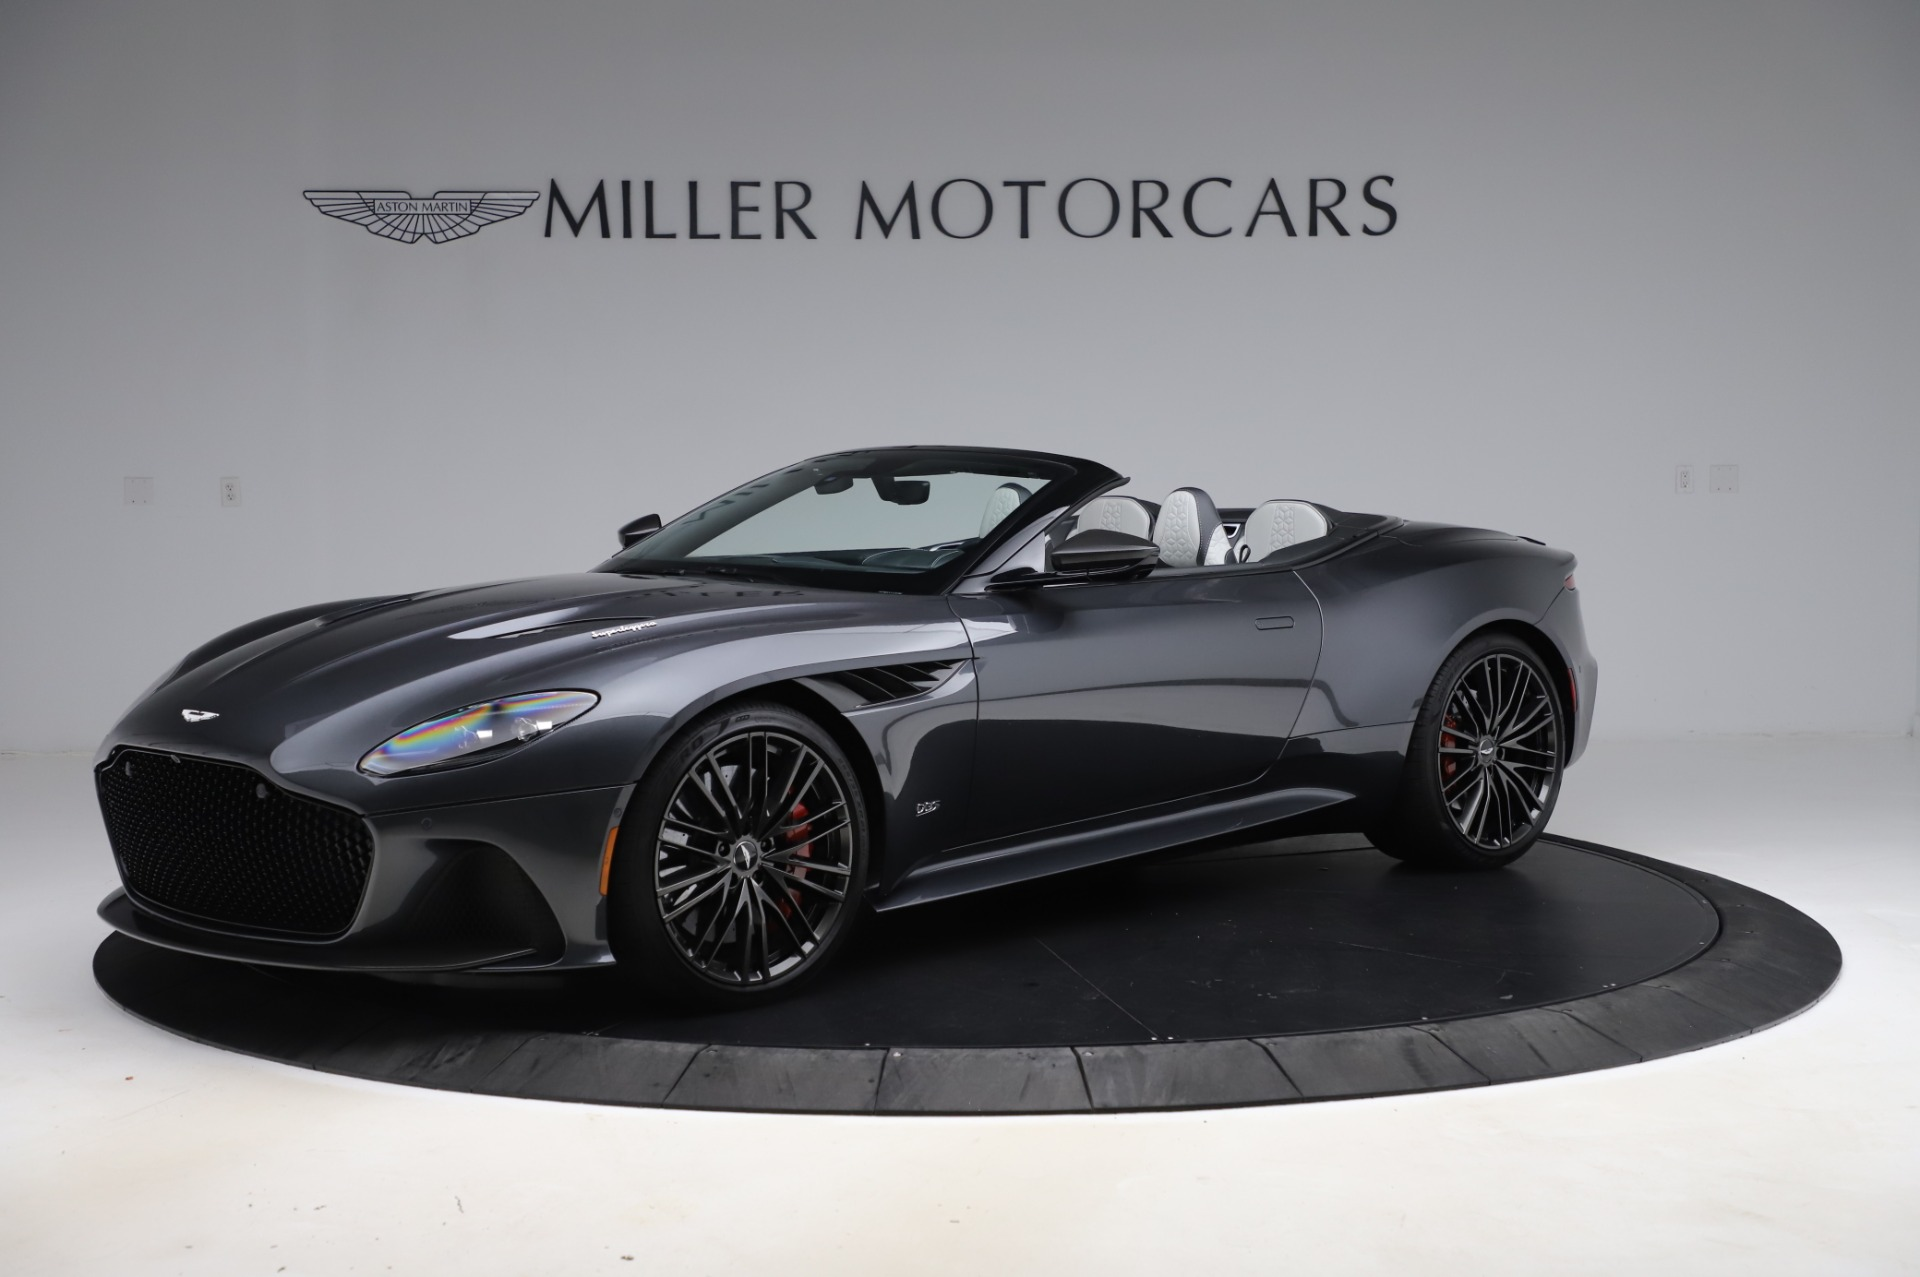 Used 2020 Aston Martin DBS Superleggera for sale $329,900 at Maserati of Westport in Westport CT 06880 1